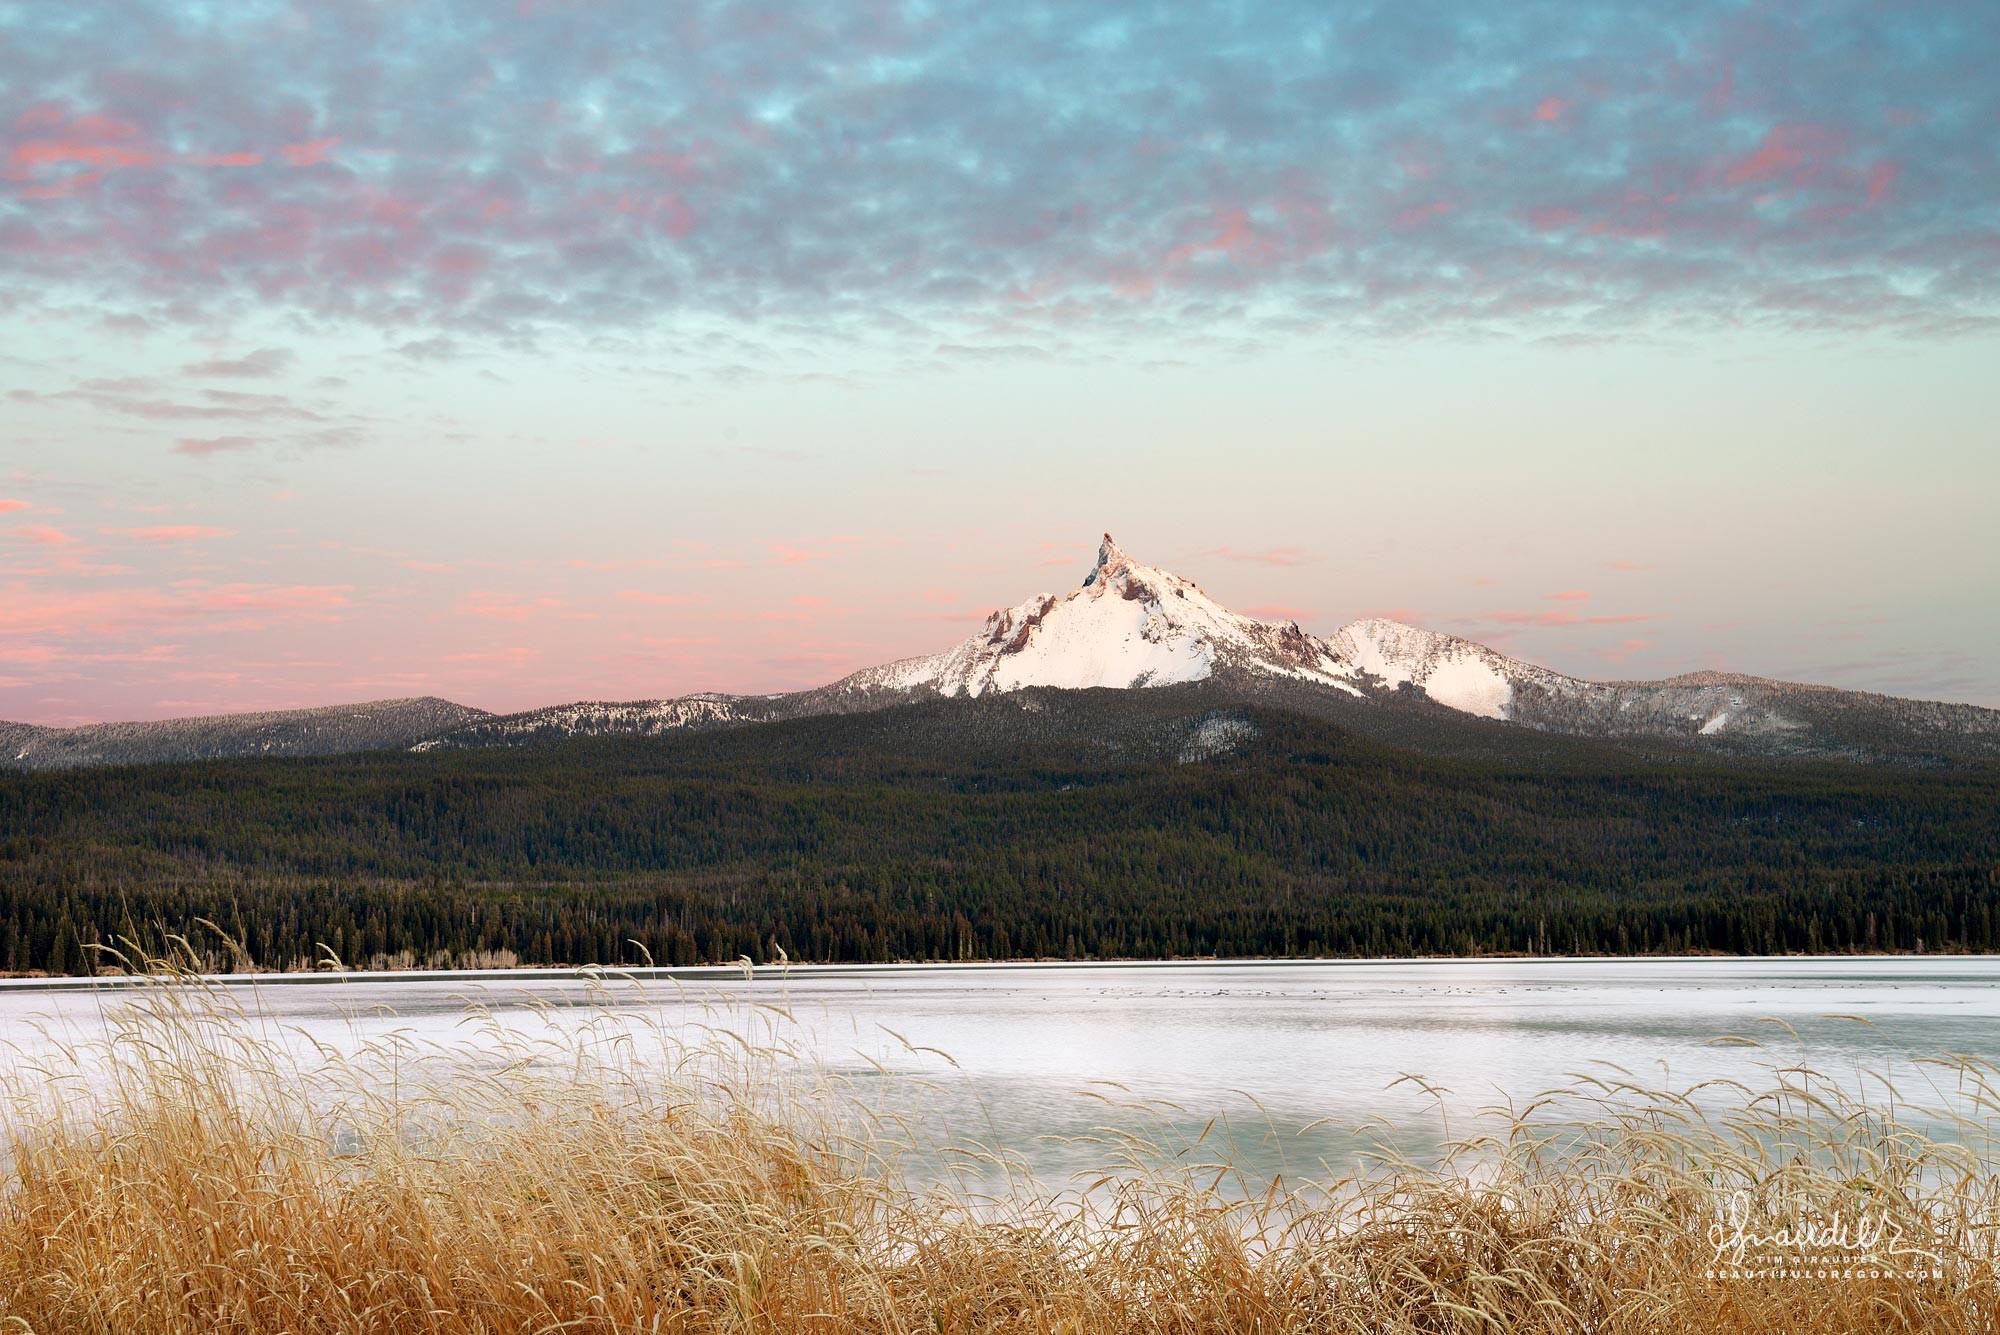 Mount Thielsen and Diamond Lake at dusk. Umpqua National Forest, Douglas County, Oregon Cascades landscape photography.